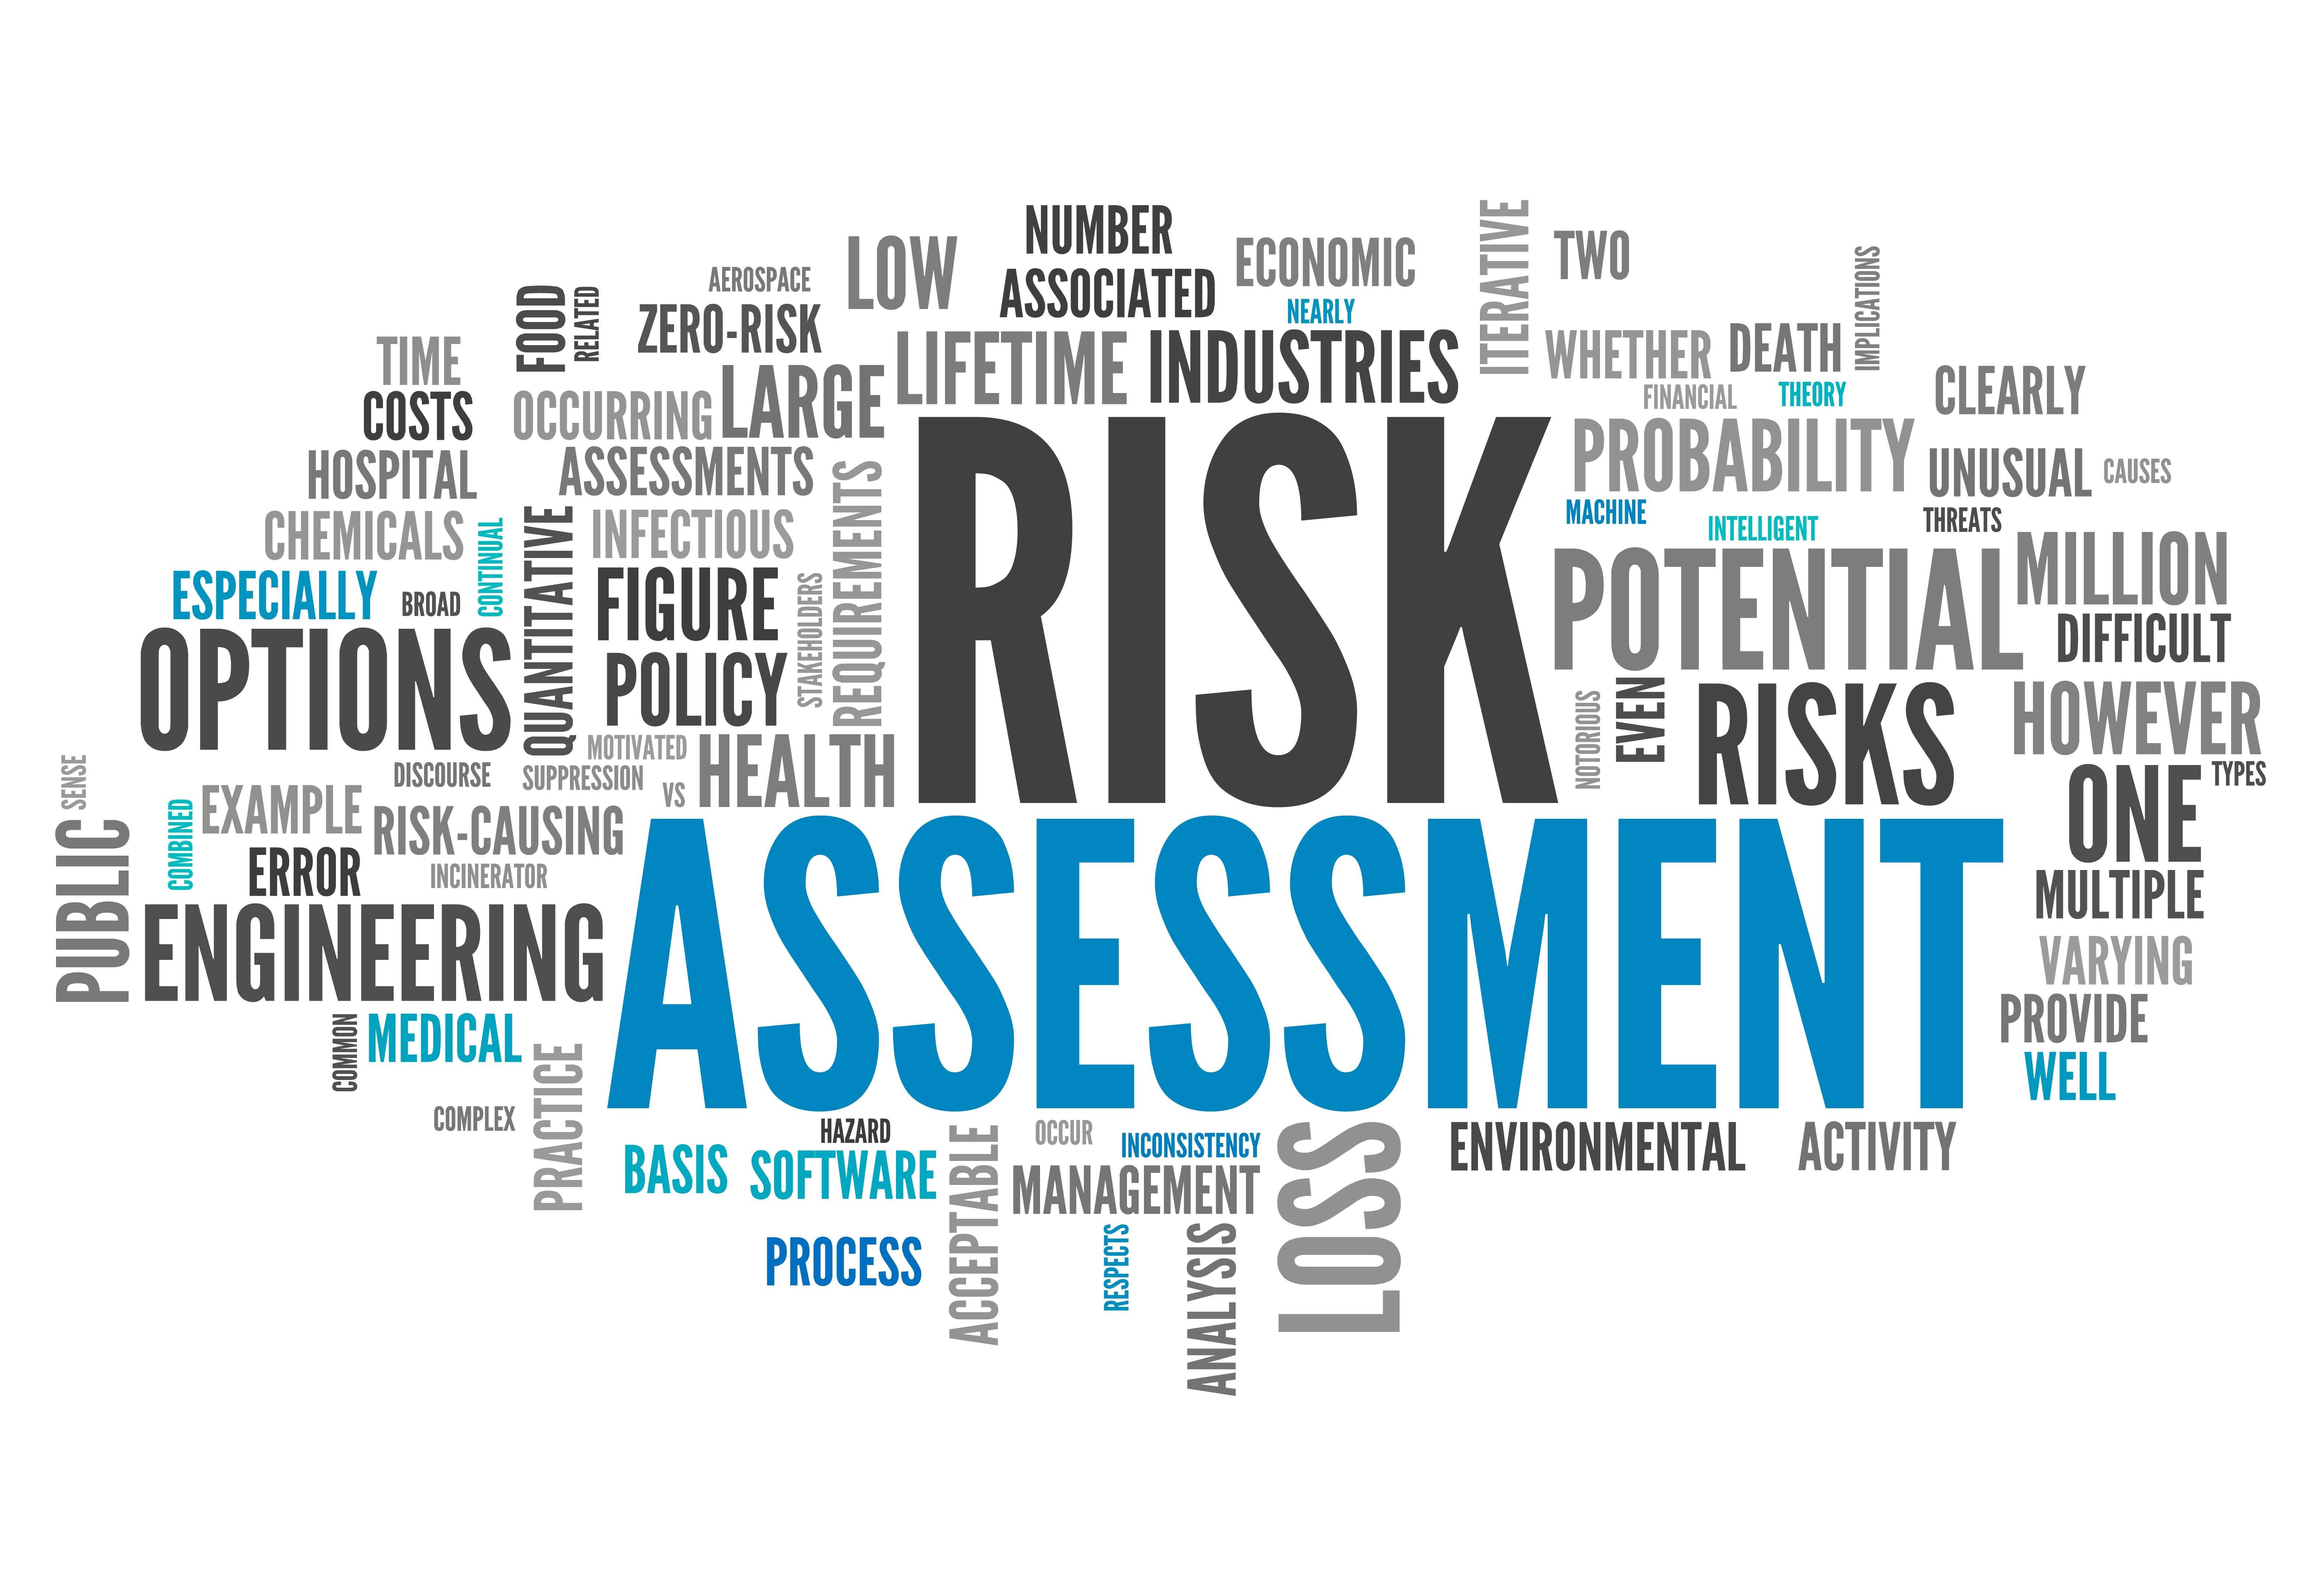 Legionella Risk Assessment Legionnaire's Disease Risk